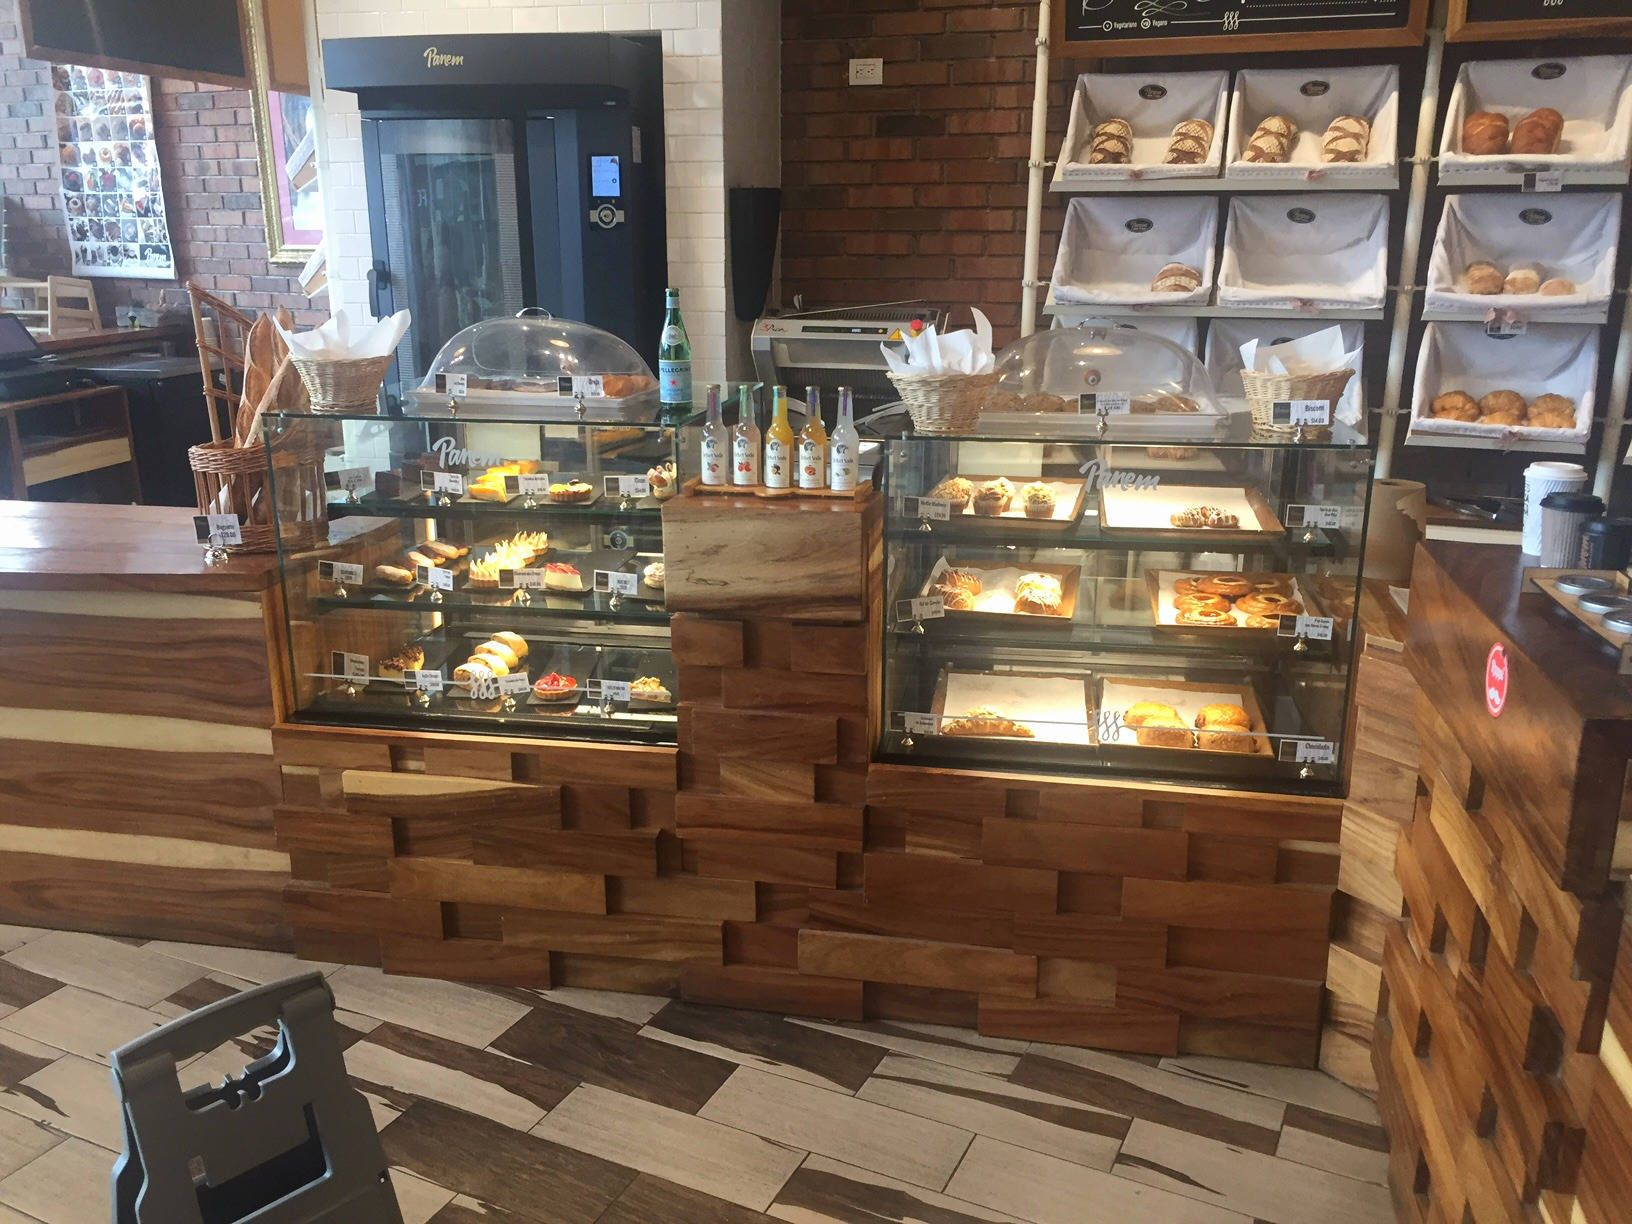 Countertop Bakery Display Case Fresh Pastry Display National